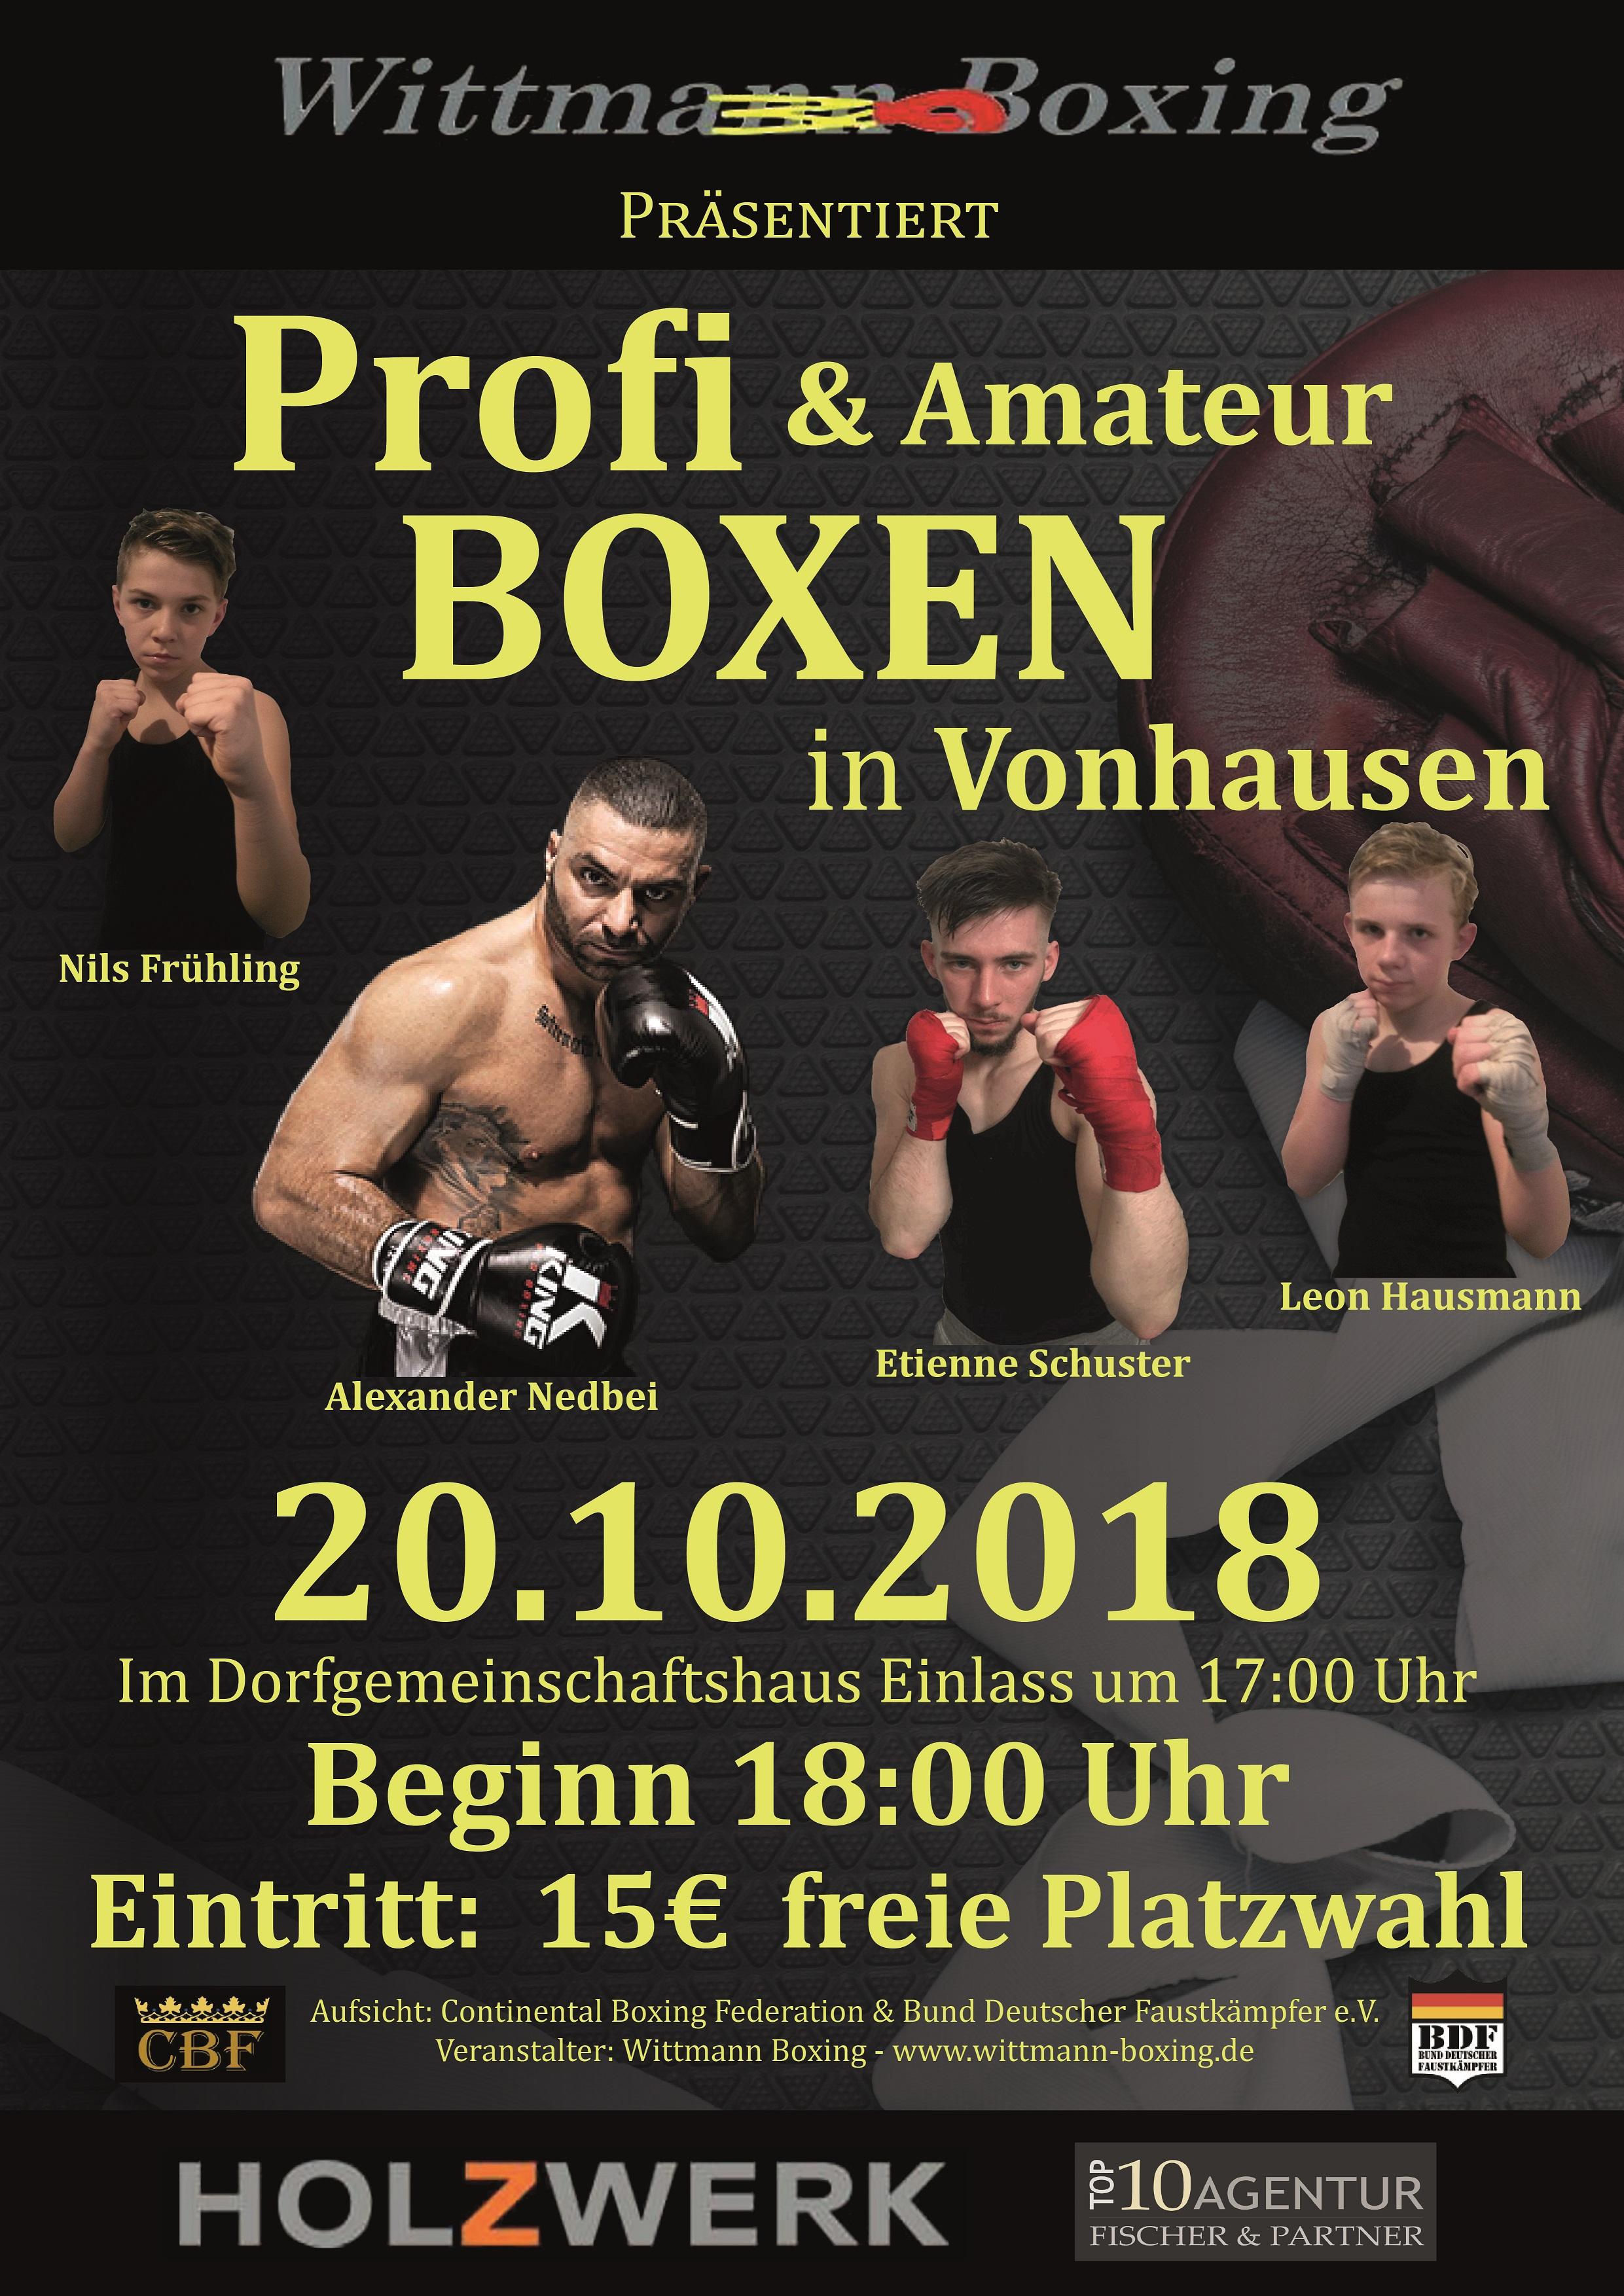 Wittmann-Boxing